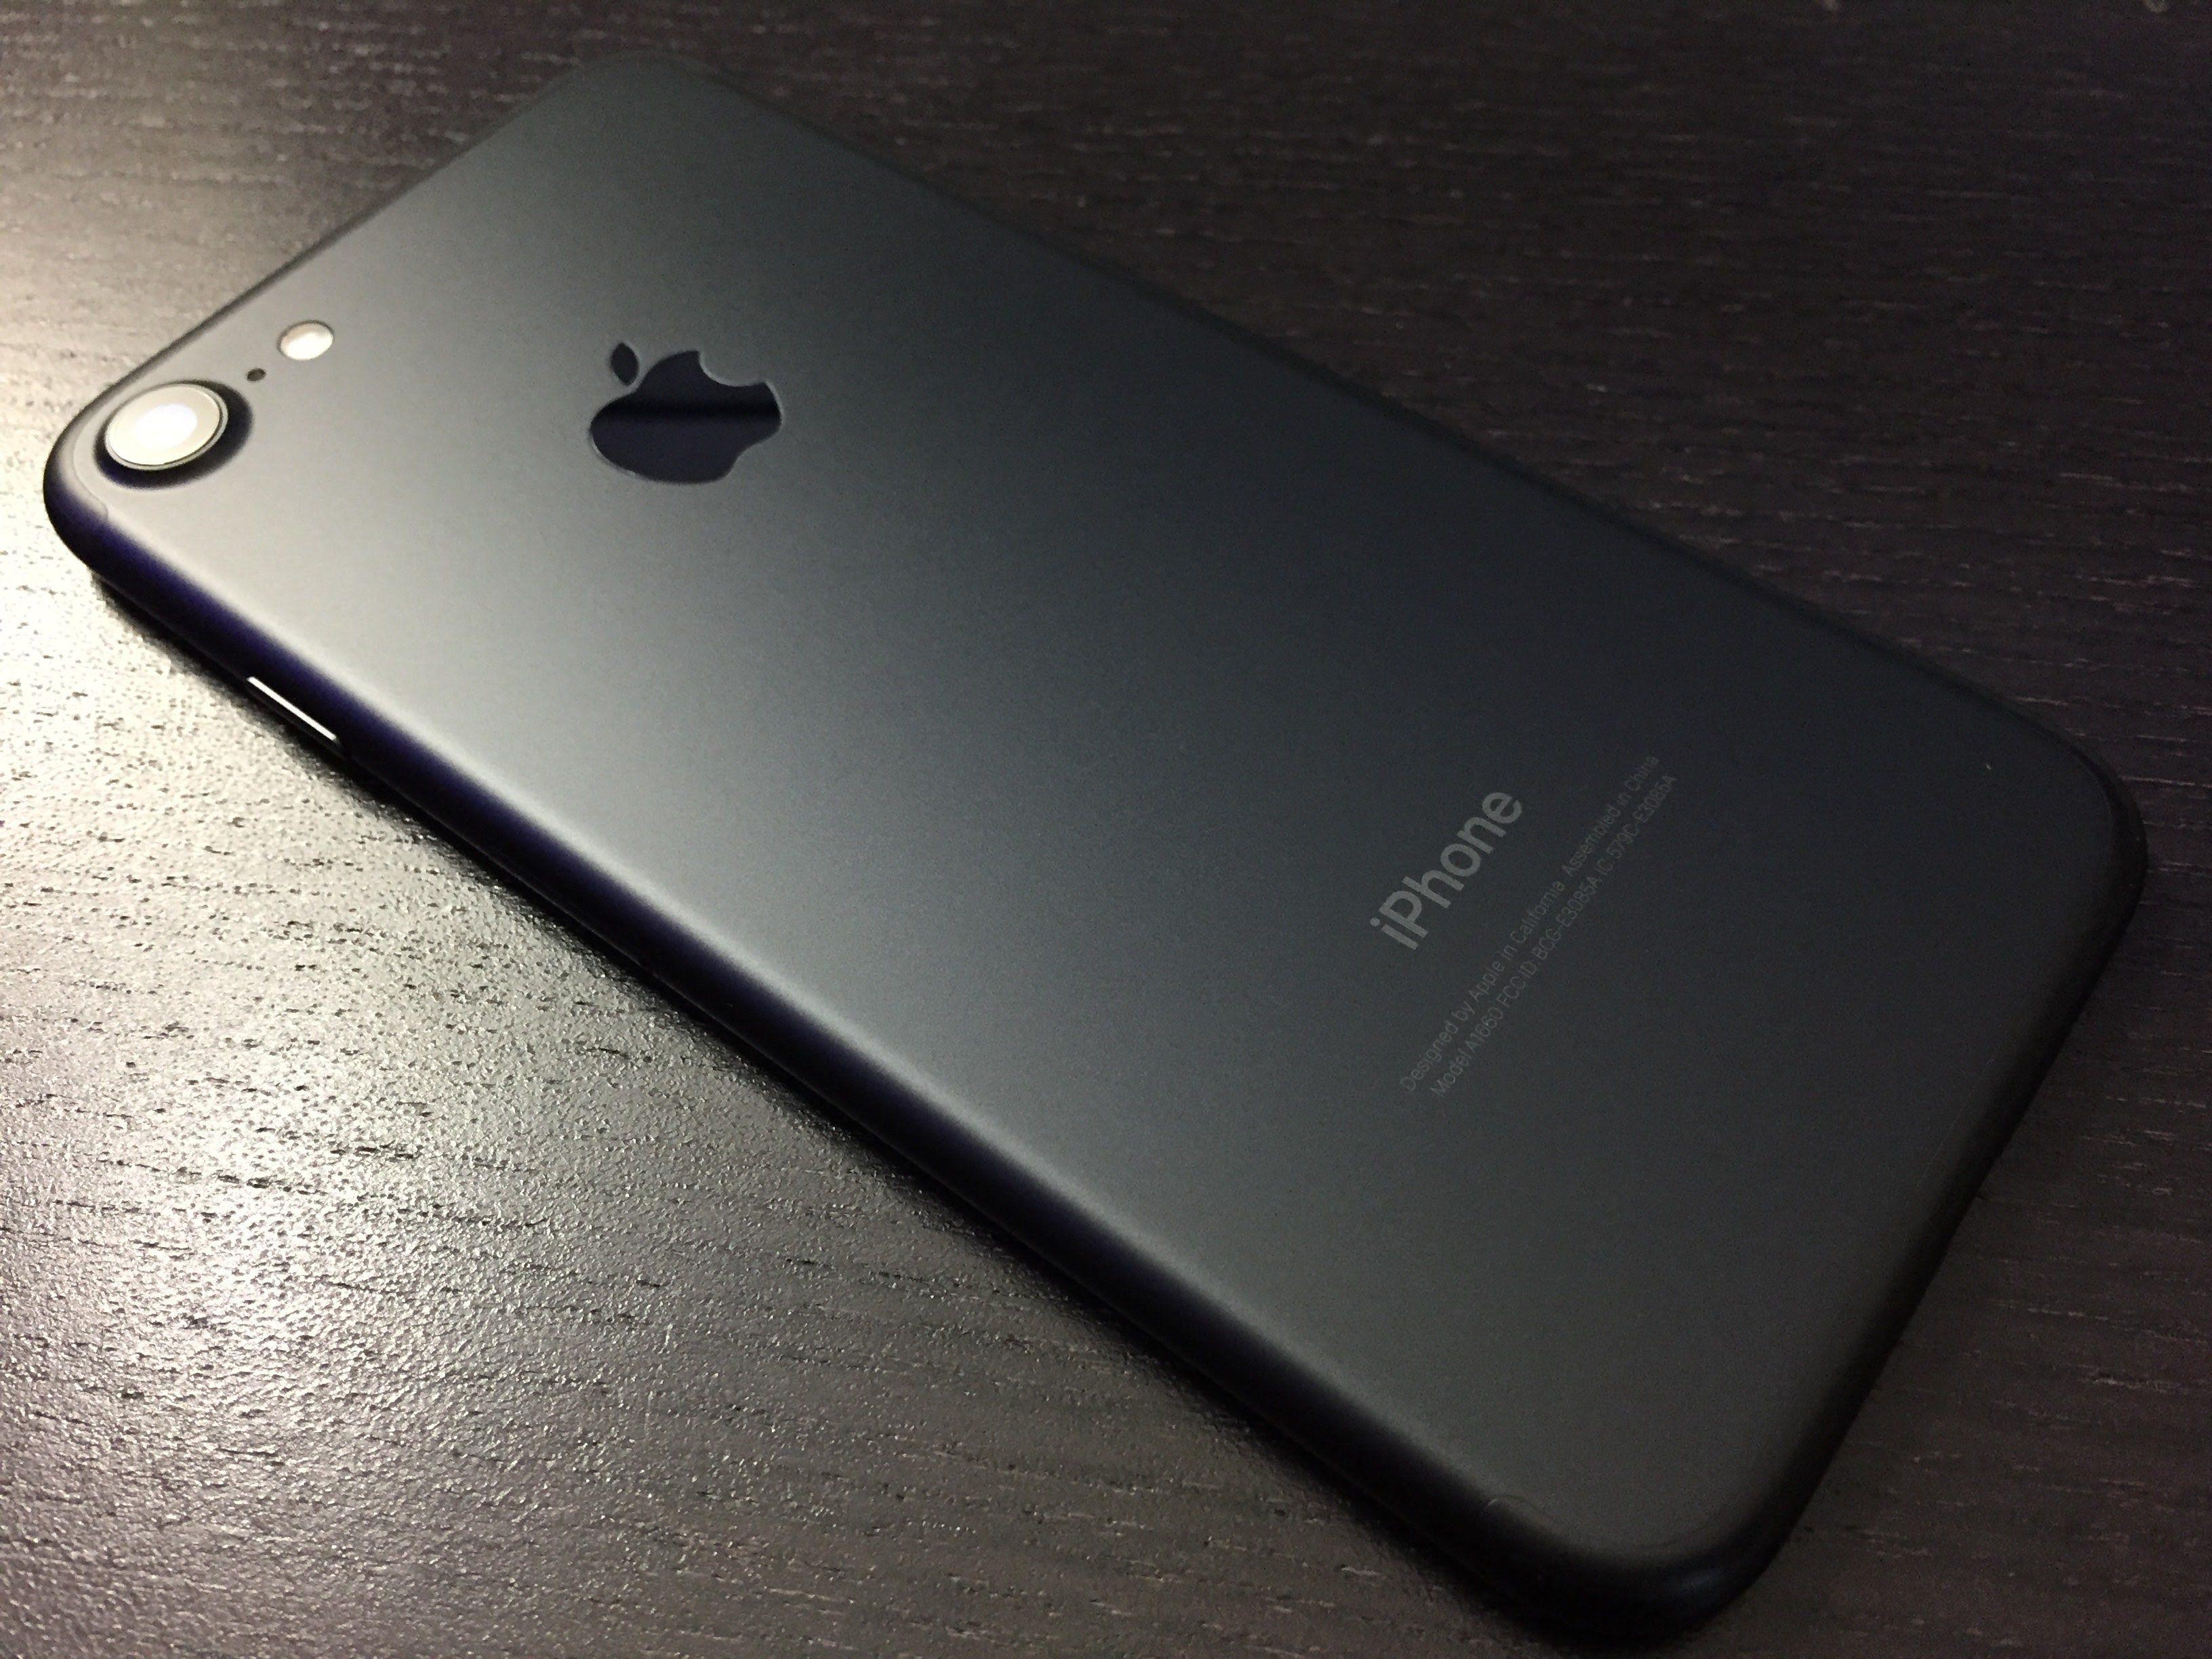 Iphone Cases Iphone 6 16gb Iphone Skins Apple Iphone 6 Apple Ipad